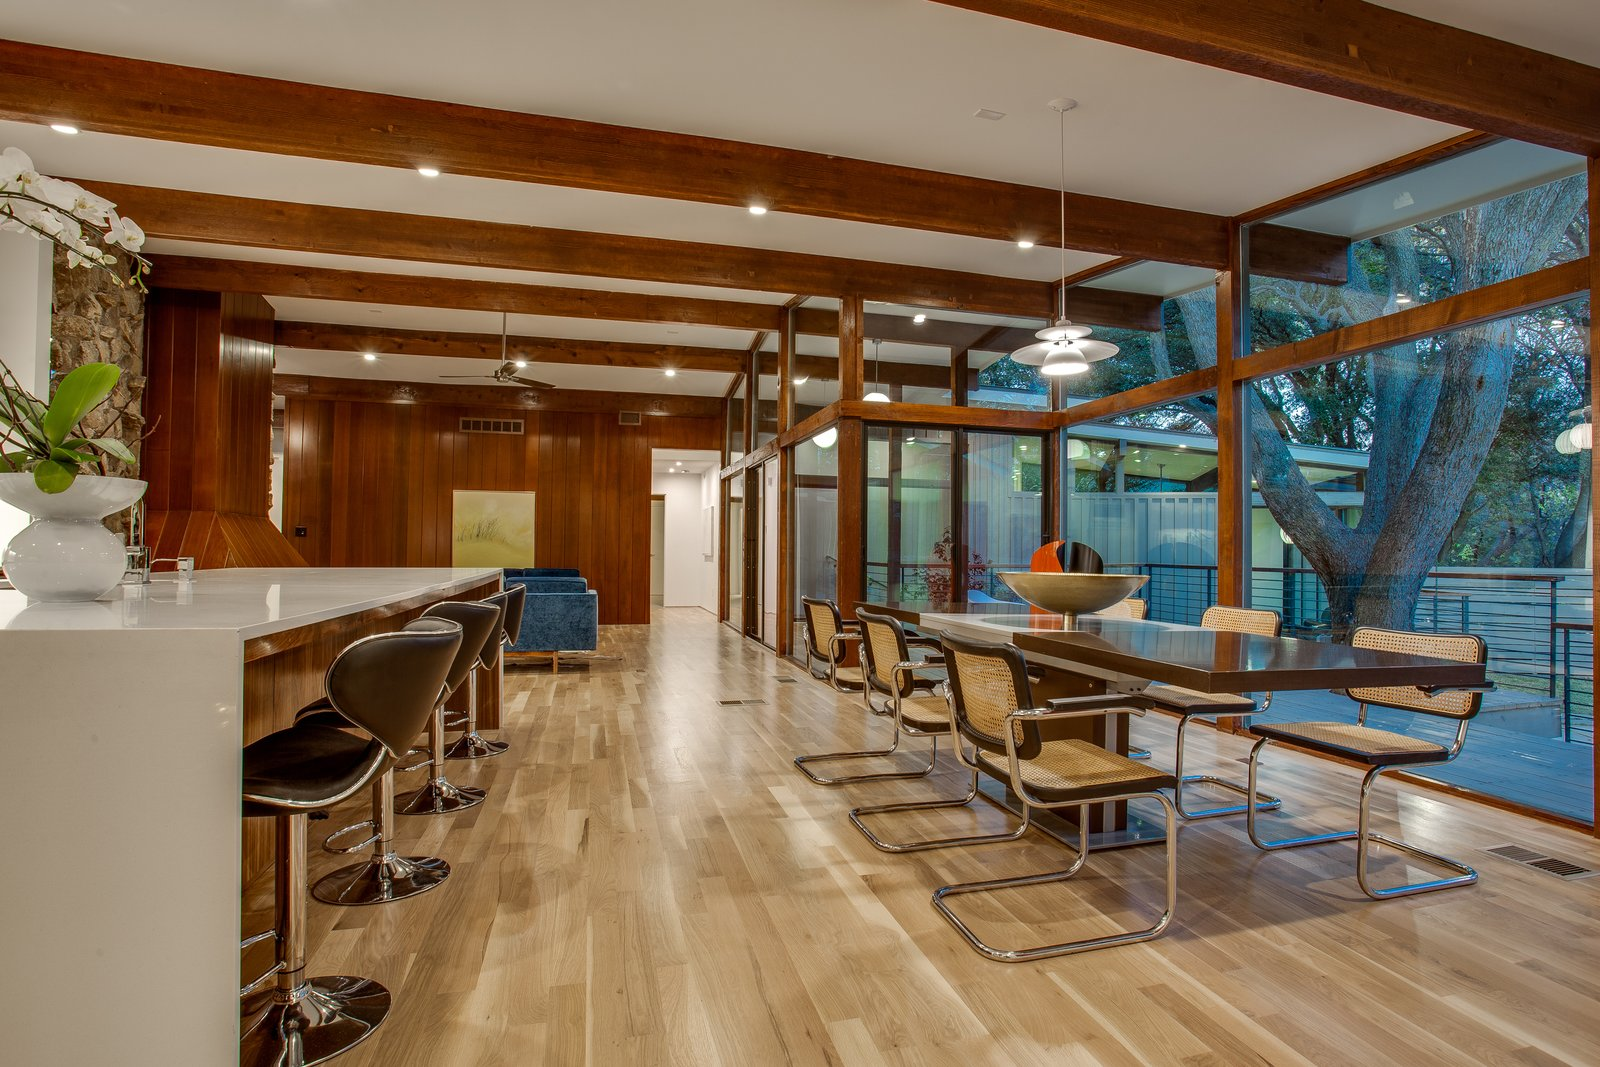 Dining Room, Table, Ceiling Lighting, Pendant Lighting, Recessed Lighting, Light Hardwood Floor, Chair, Stools, and Bar  1963 Post and Beam Mid Century Modern by Tavis Westbrook